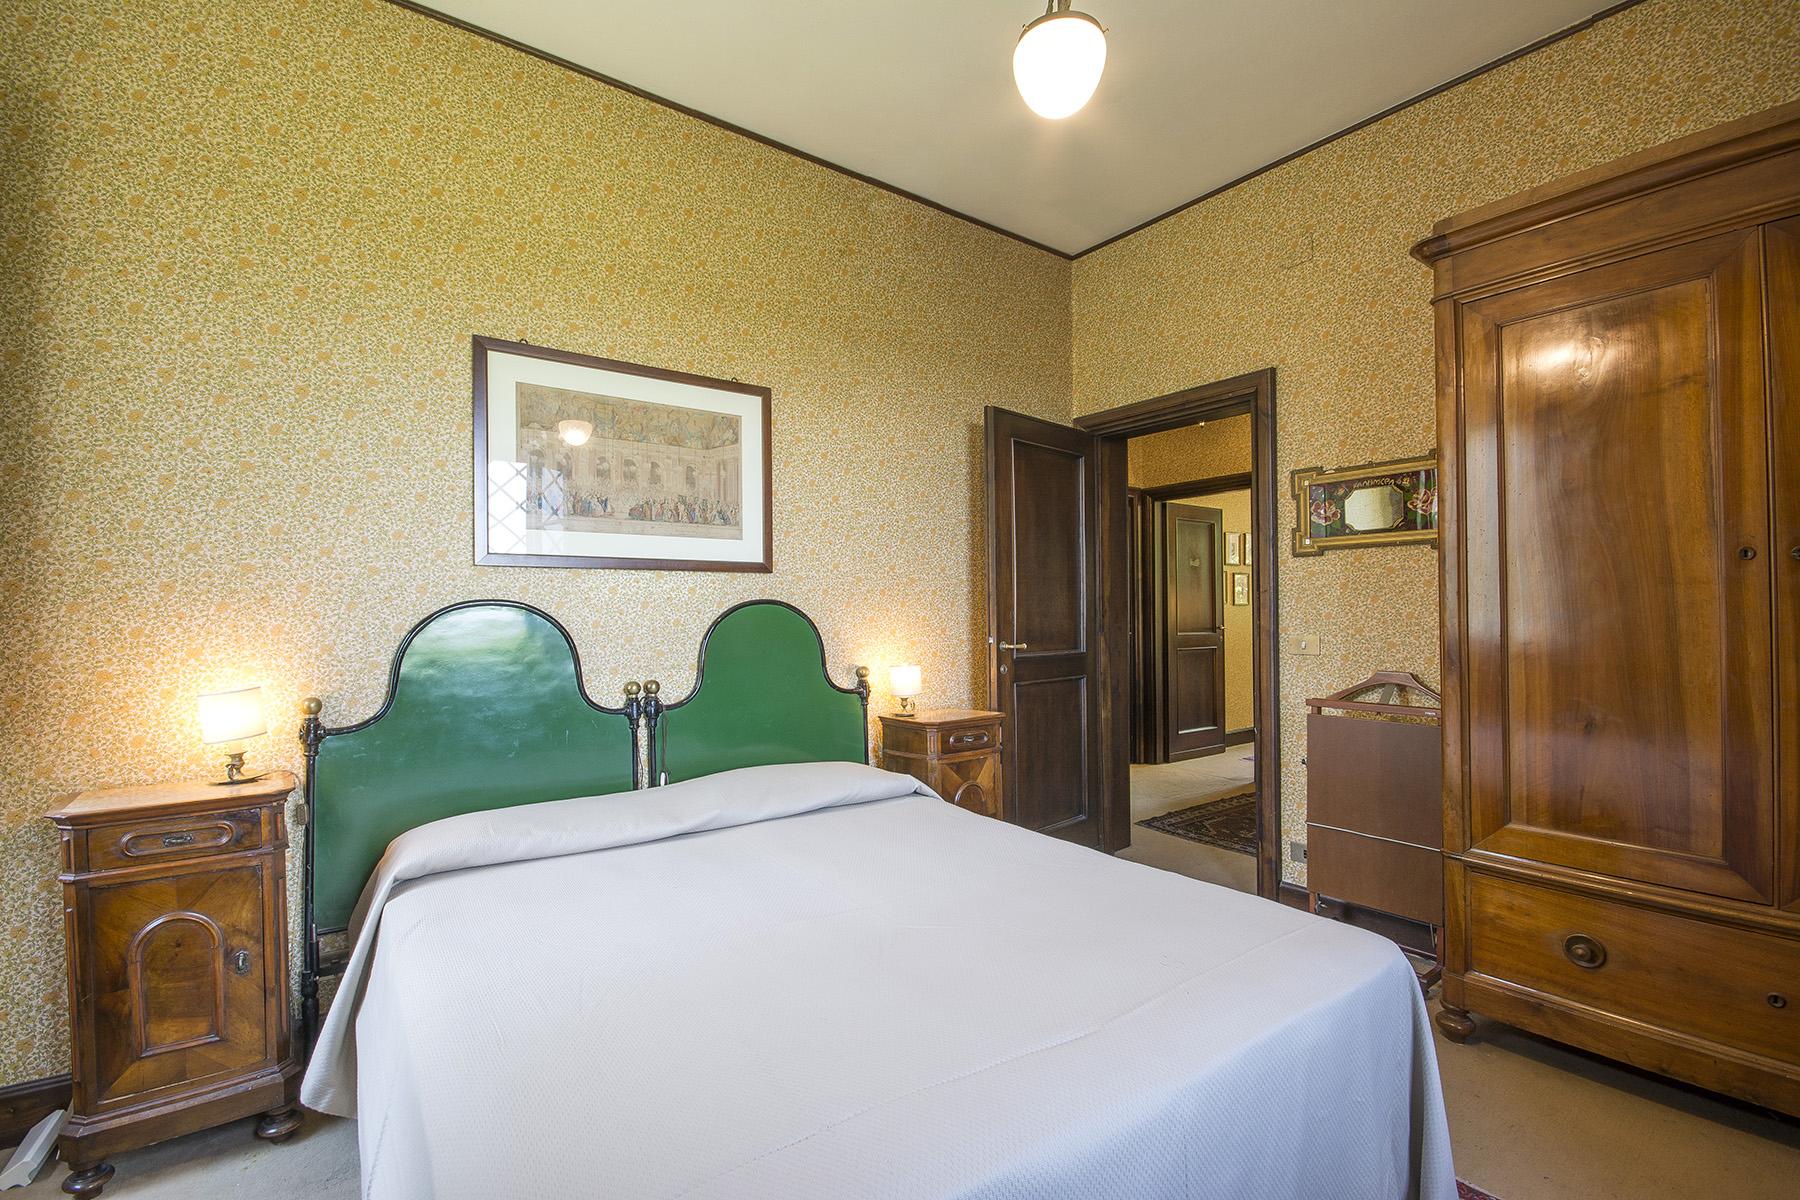 Villa in Vendita a Lucca: 5 locali, 600 mq - Foto 19